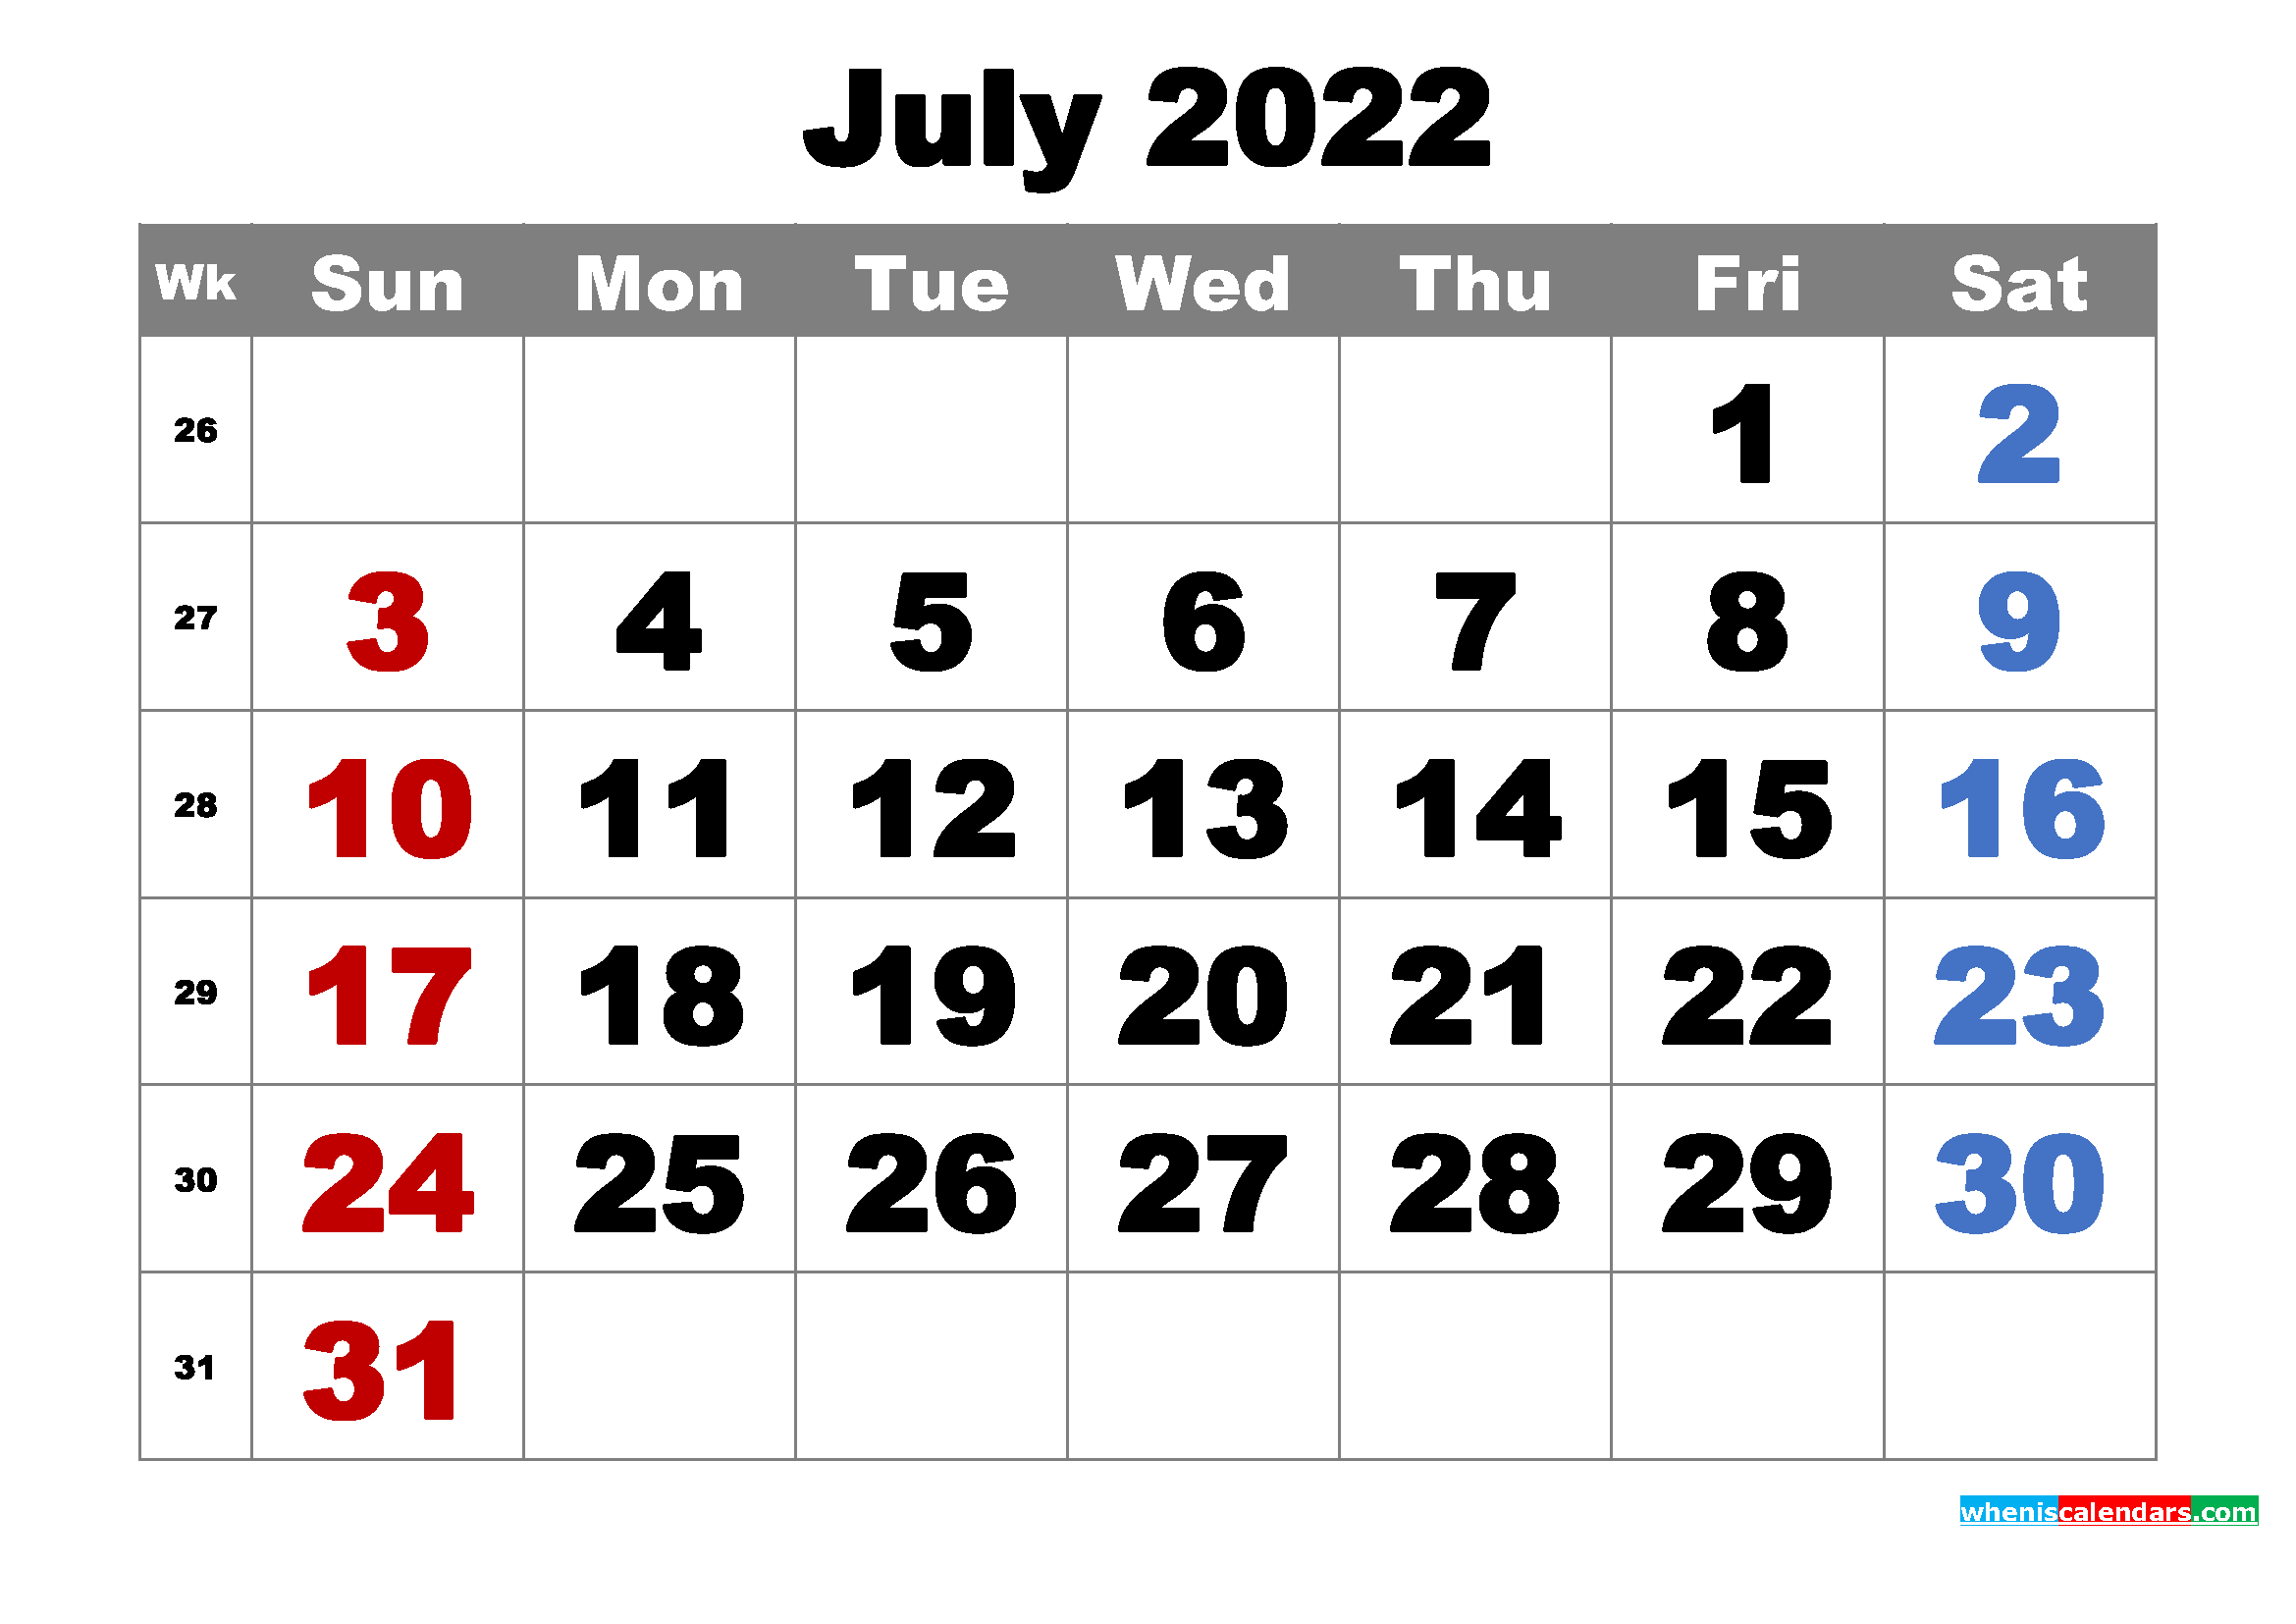 Free Printable July 2022 Calendar Word, Pdf, Image